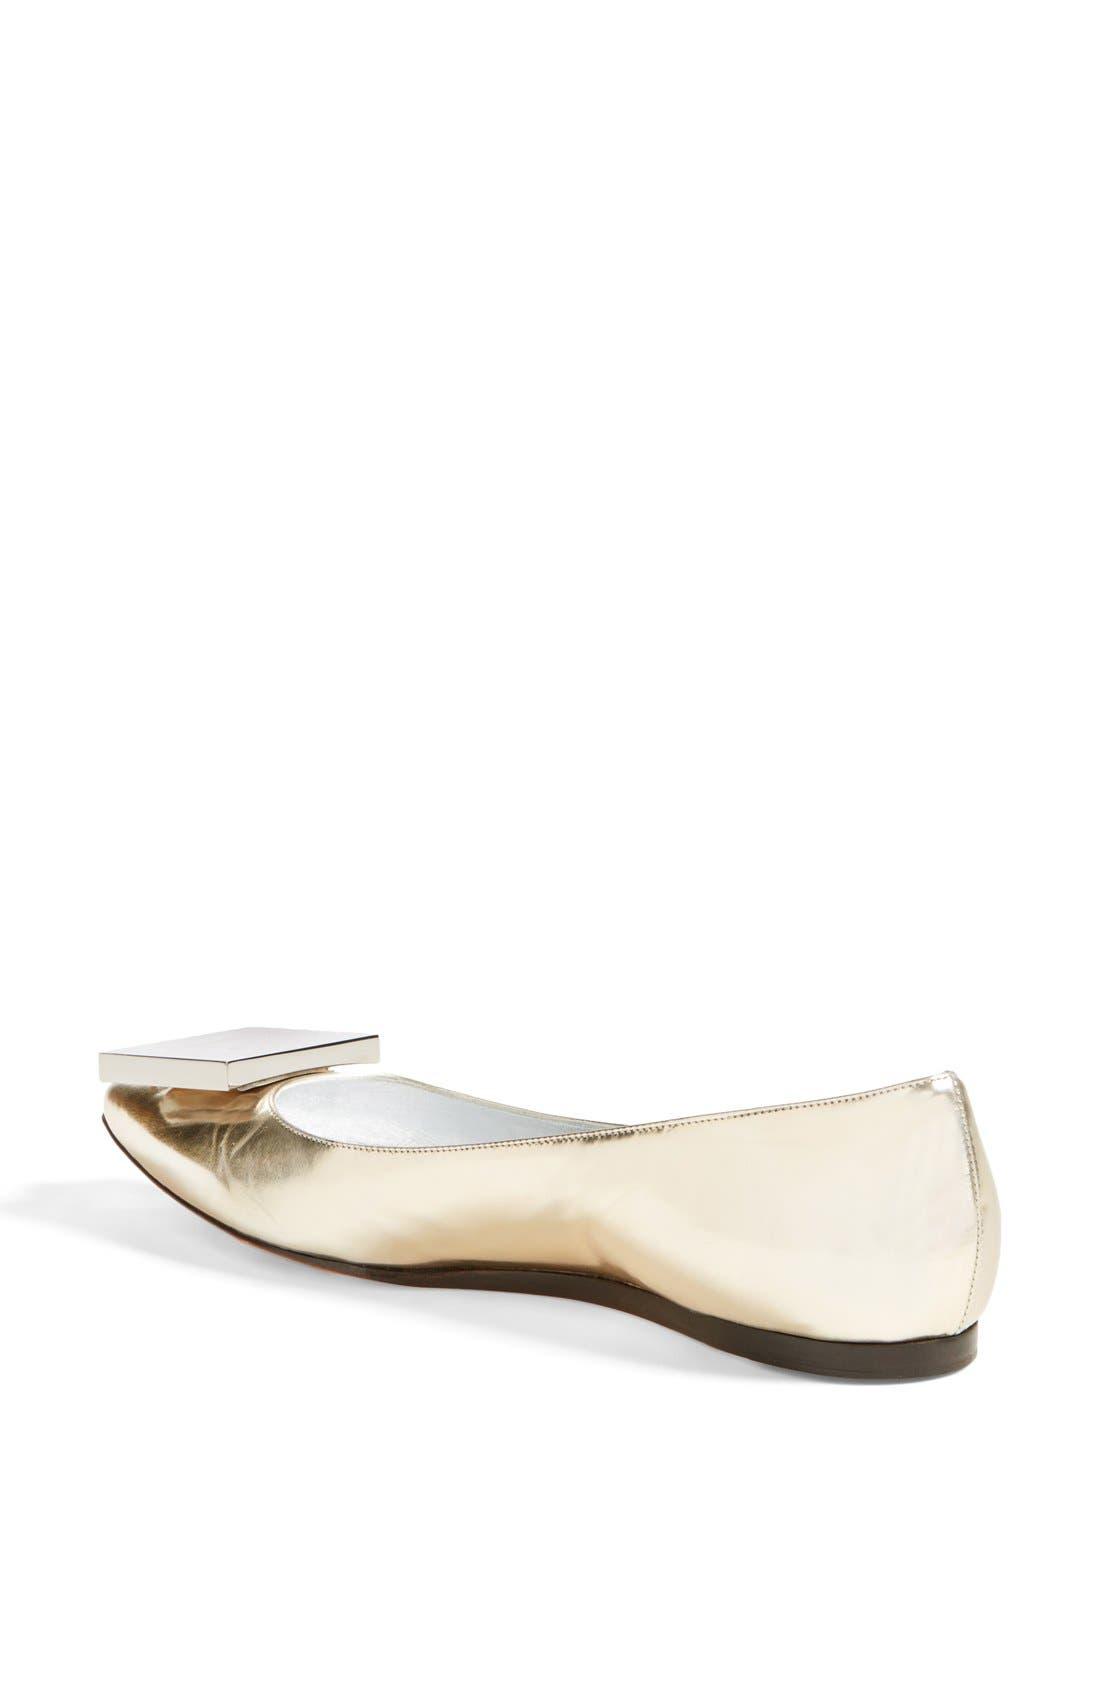 Alternate Image 2  - Acne Studios 'Aida' Pointy Toe Metallic Leather Flat